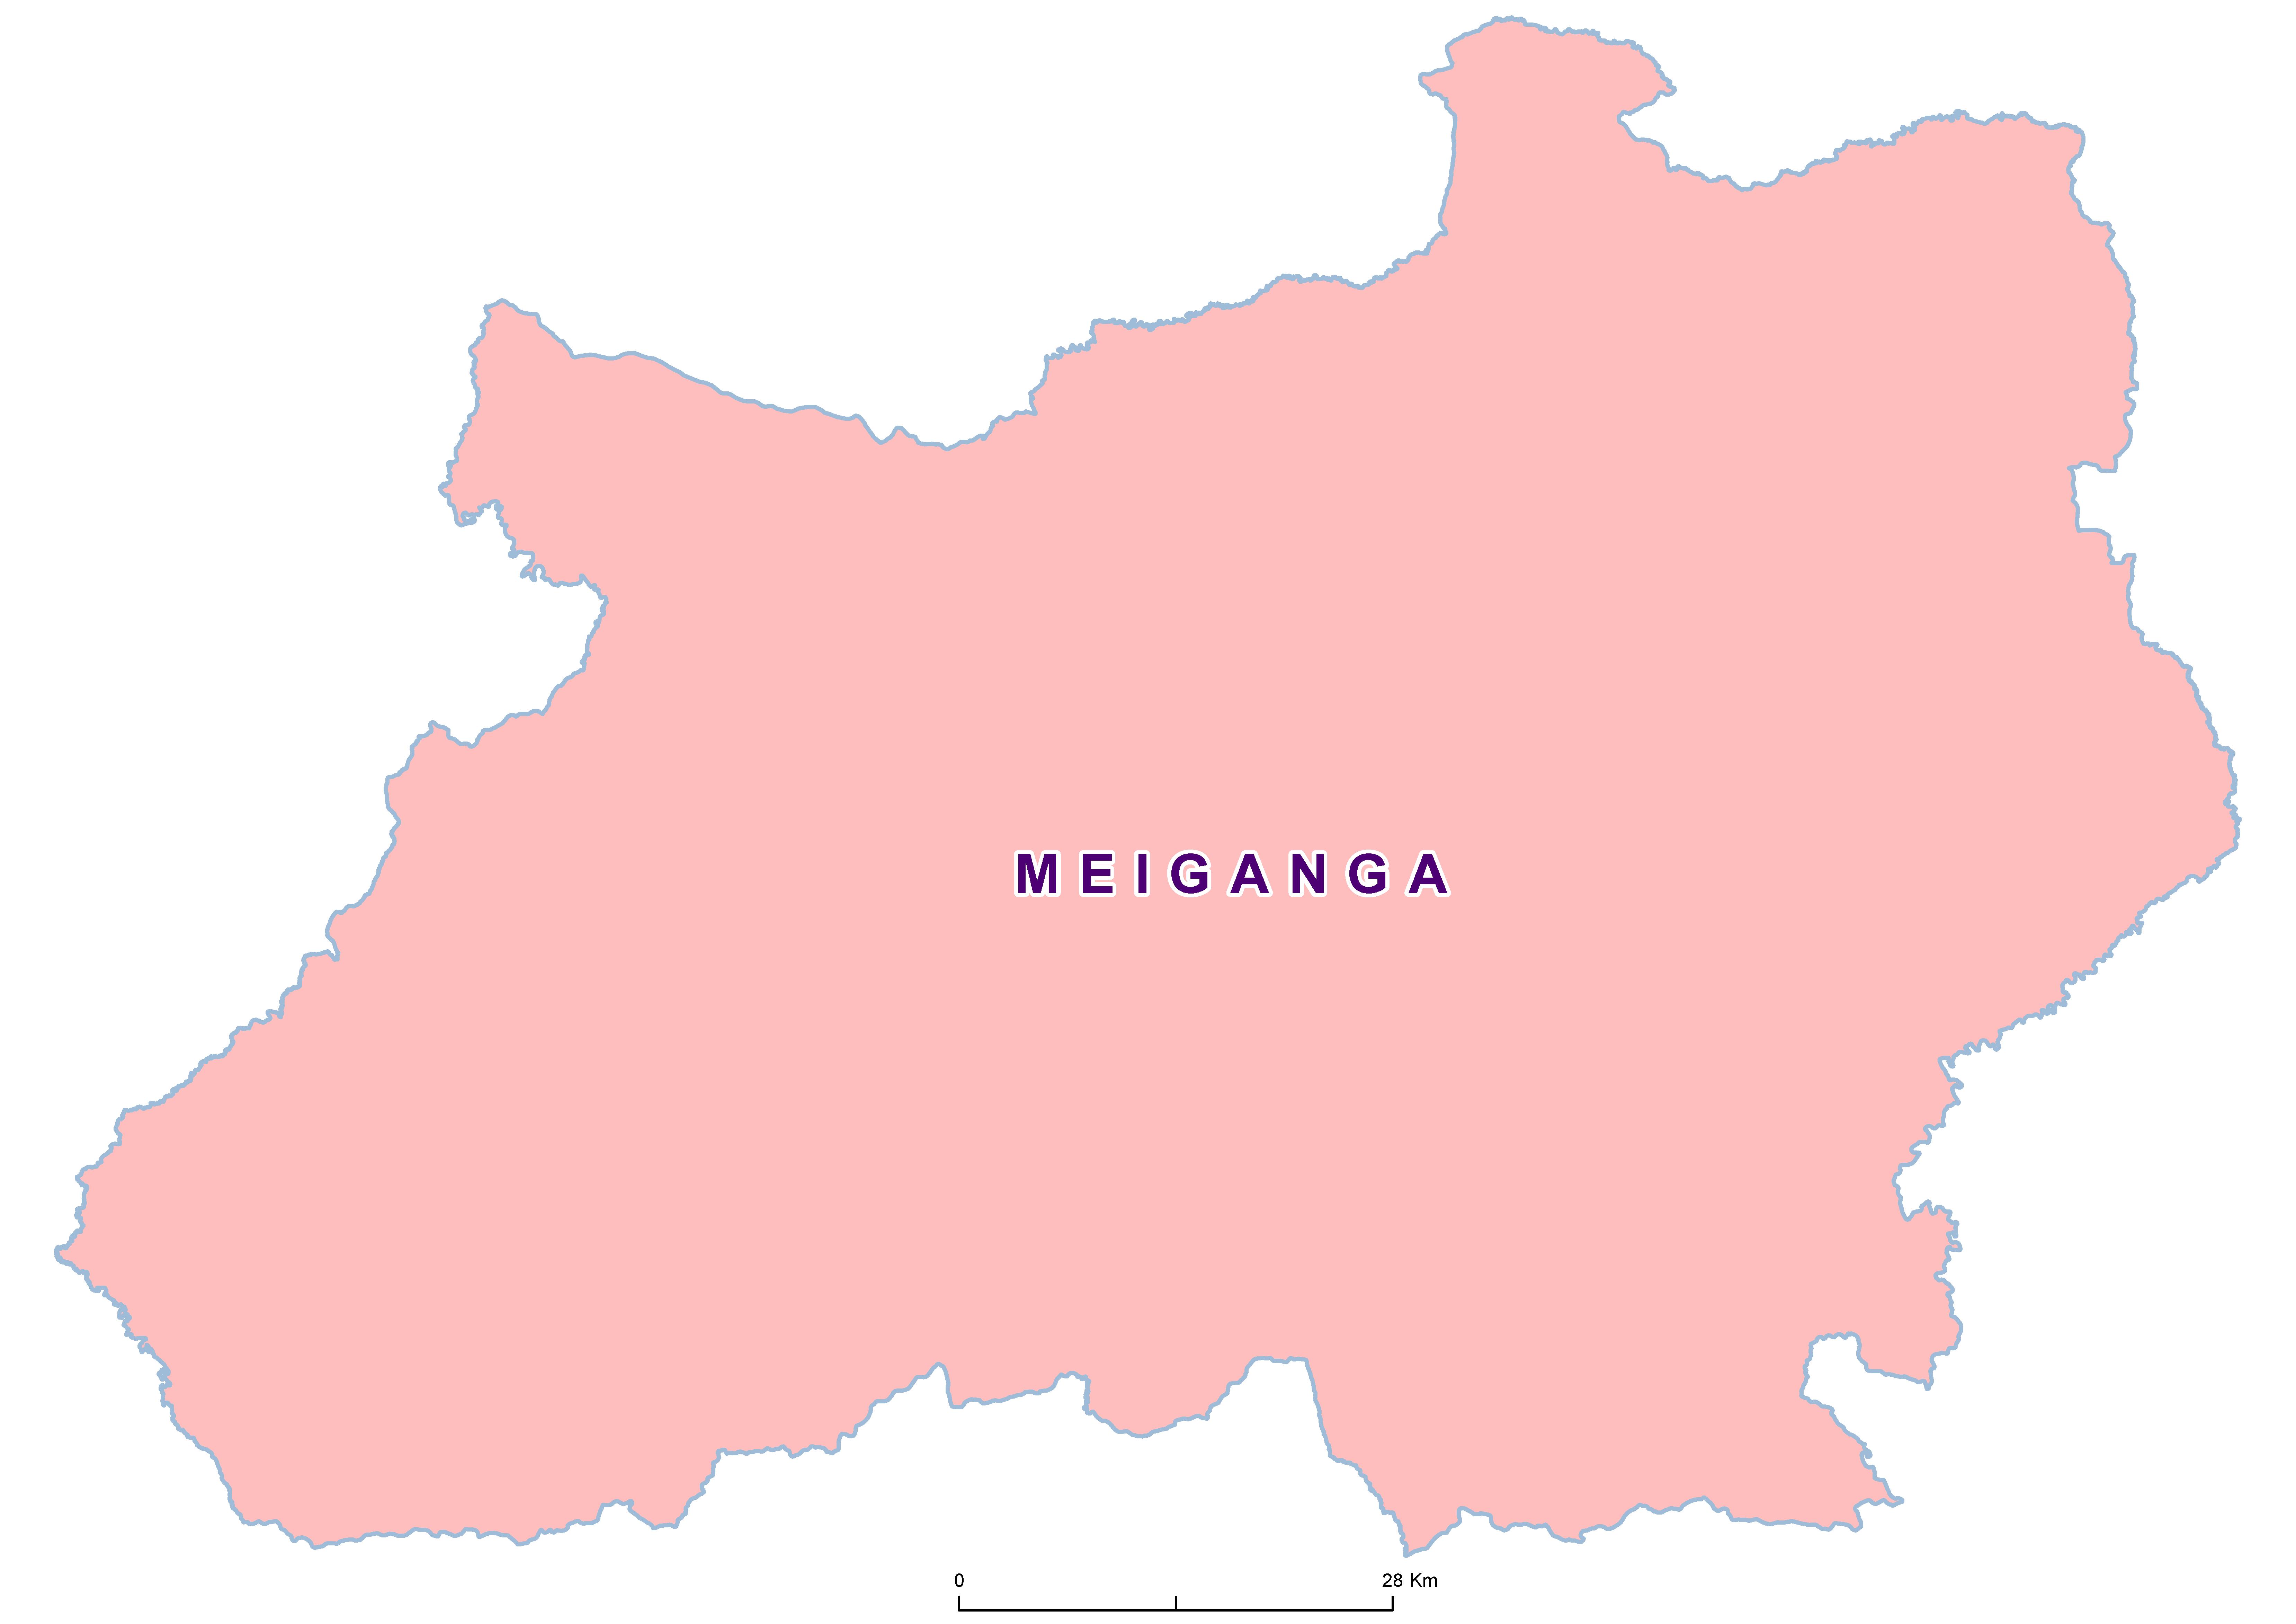 Meiganga Mean STH 20100001